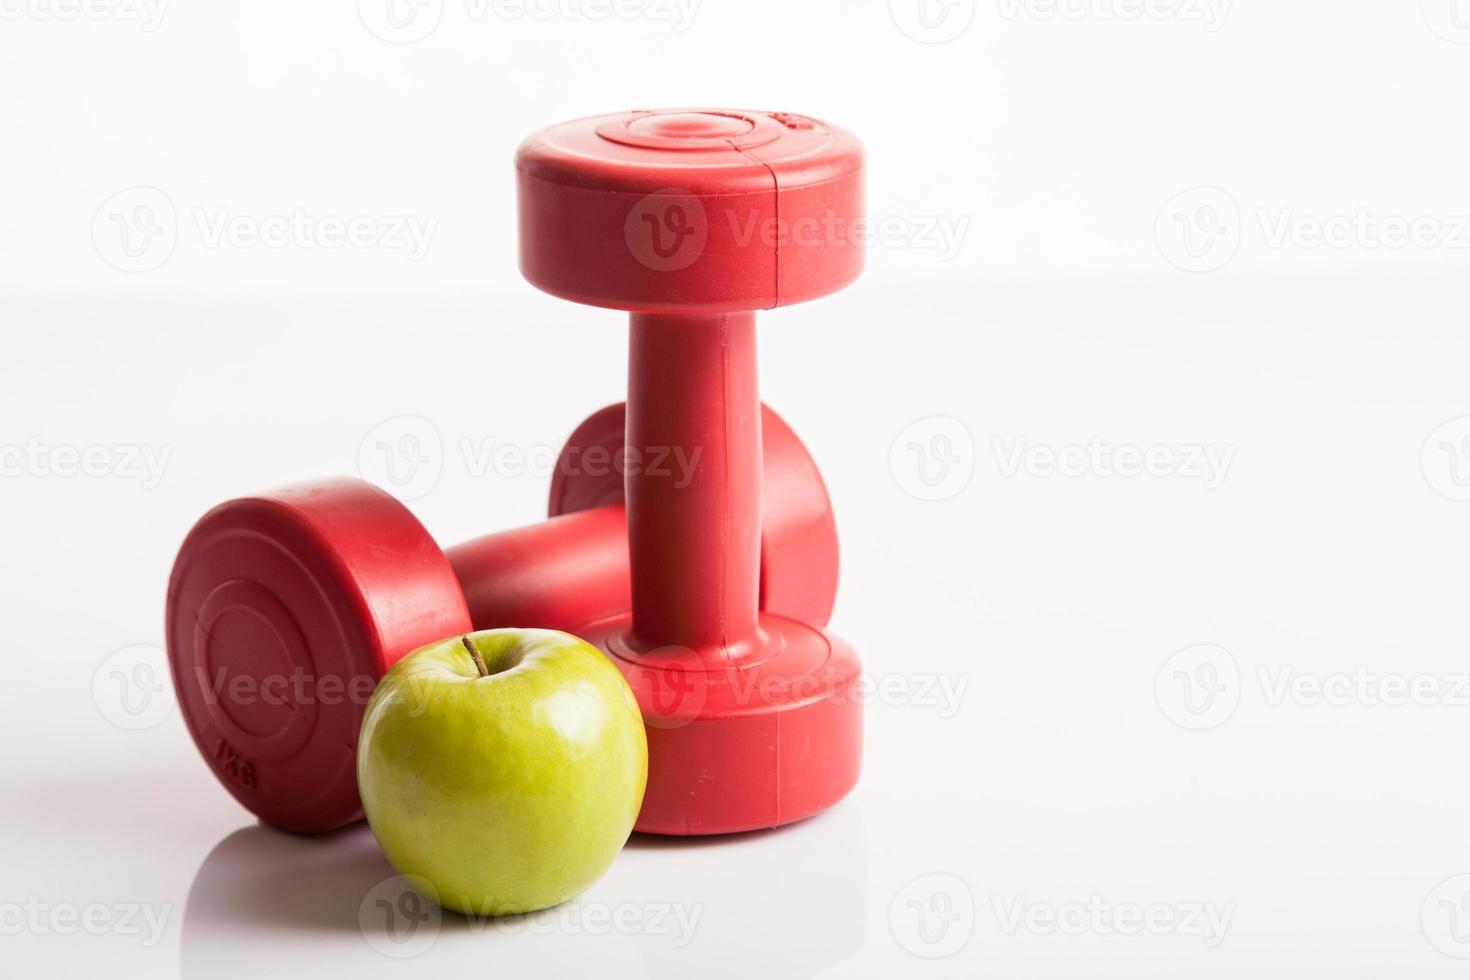 manubri rossi peso con mela verde foto